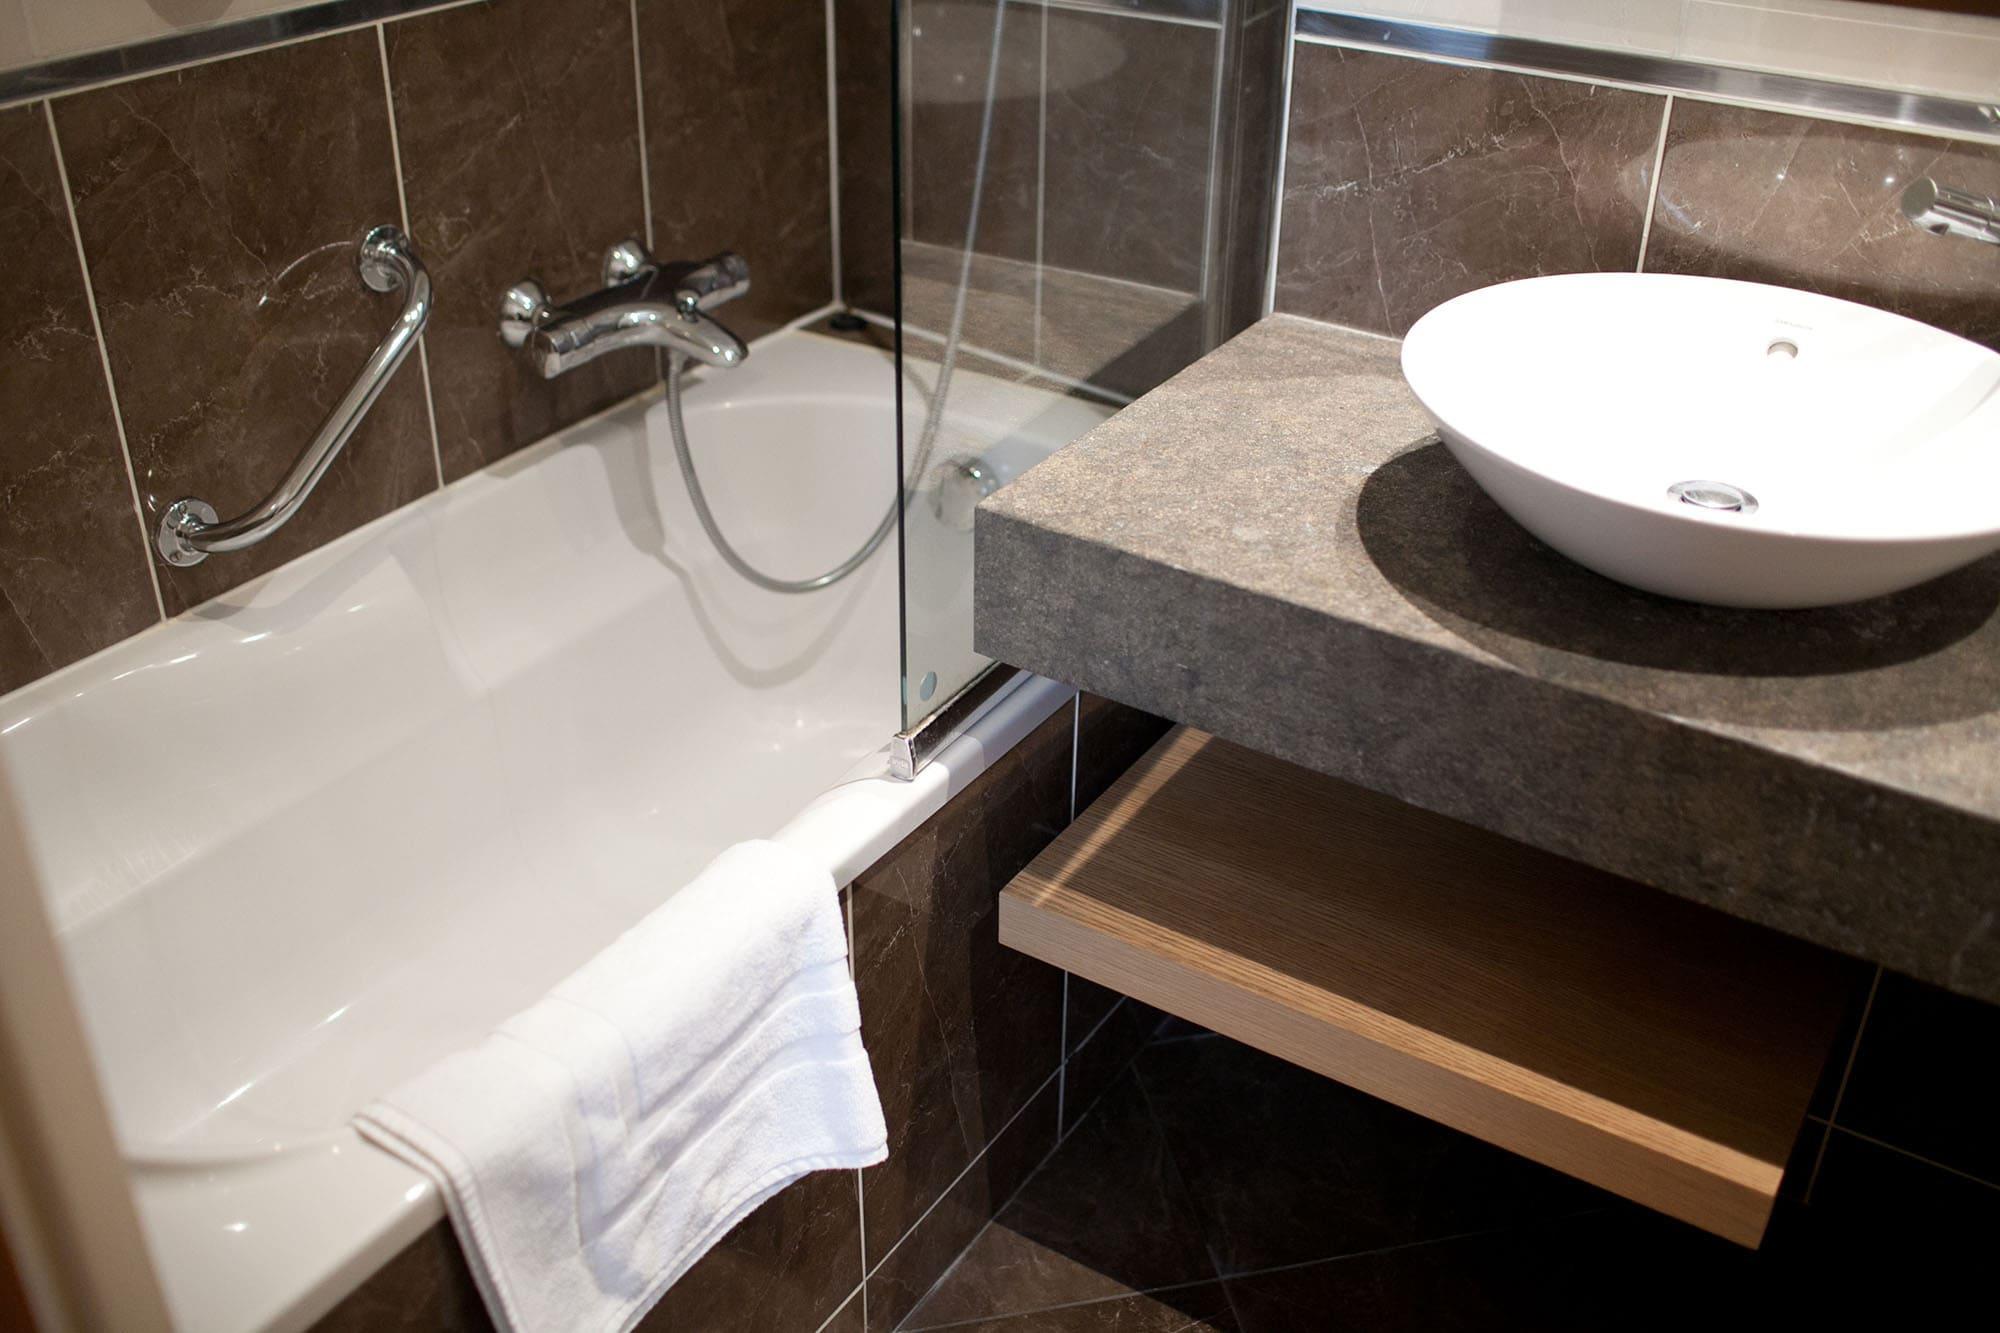 Bathtub in my Paris hotel room.